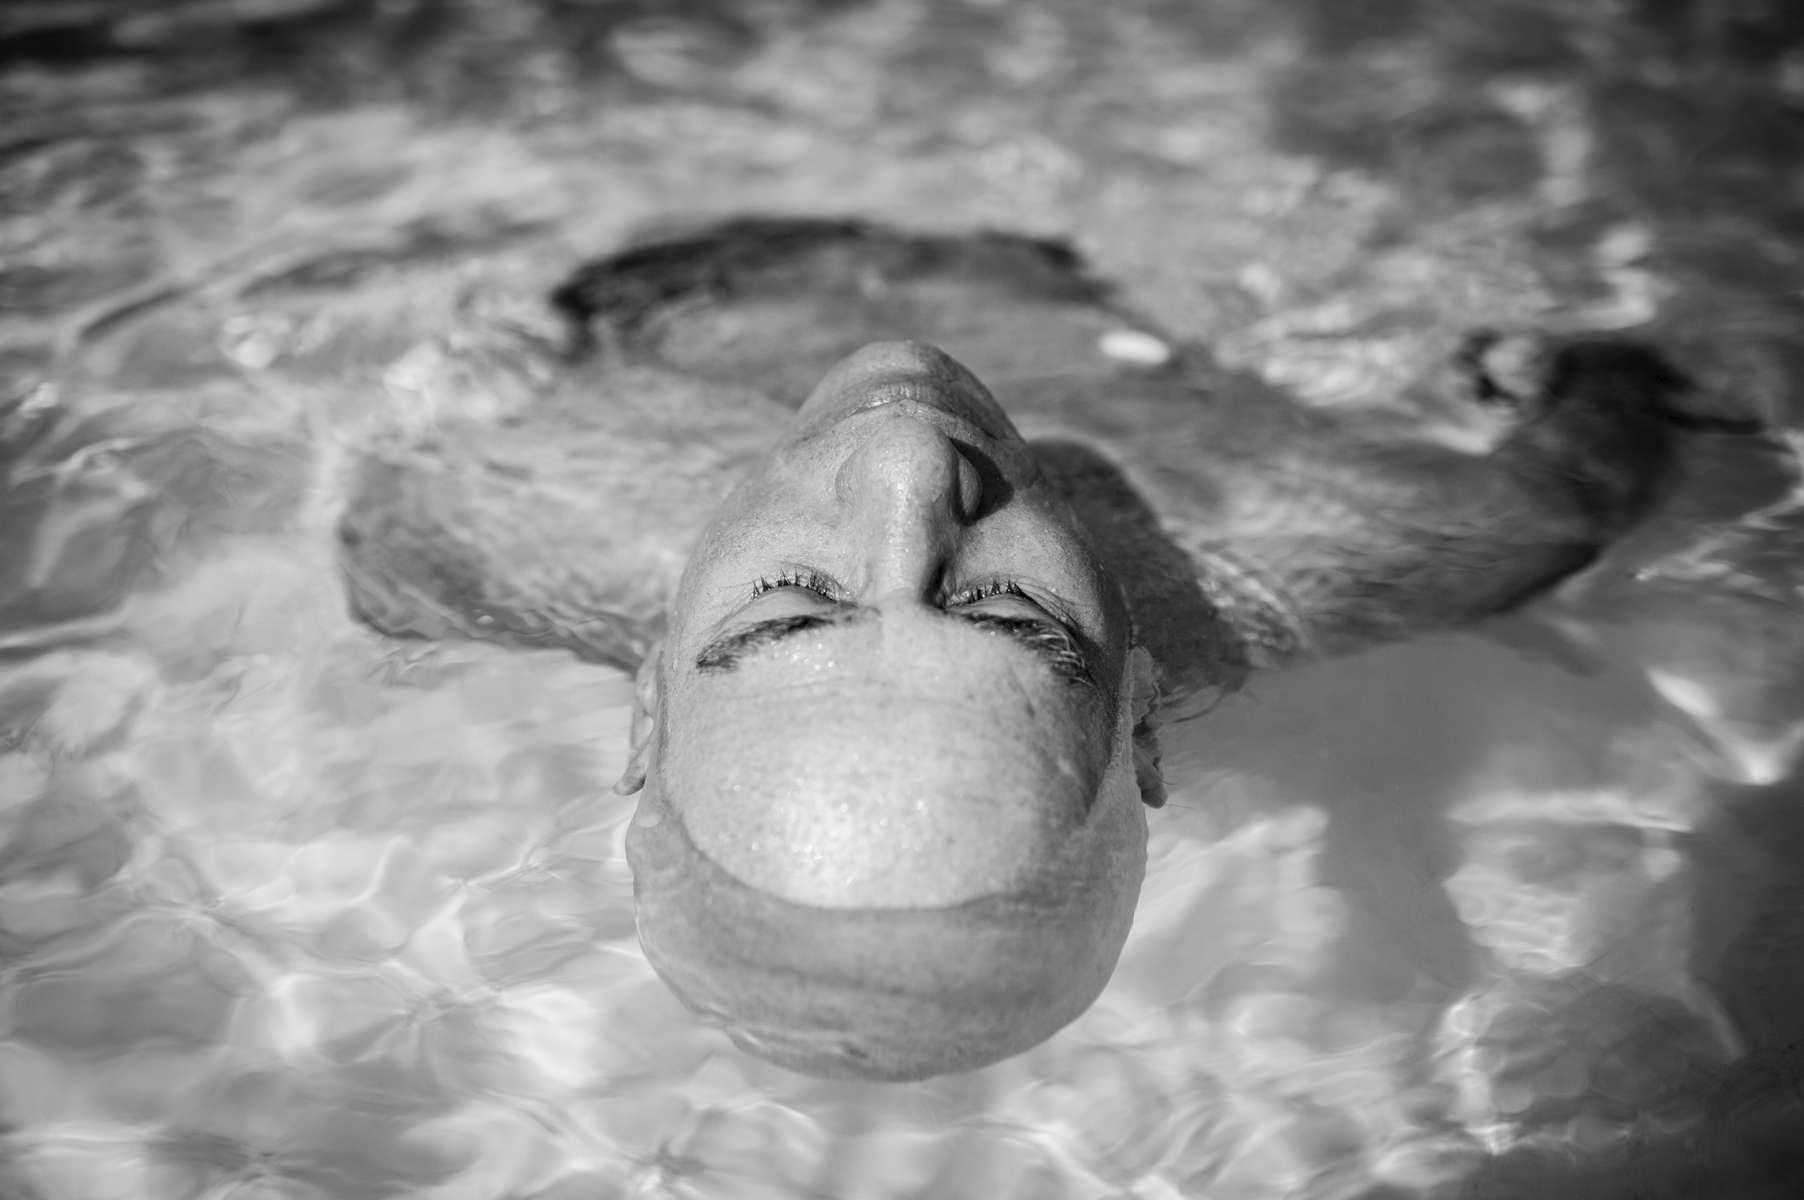 Nancy Borowick,  The Family Imprint  (photography), 2012-2015. Image cc Borowick.